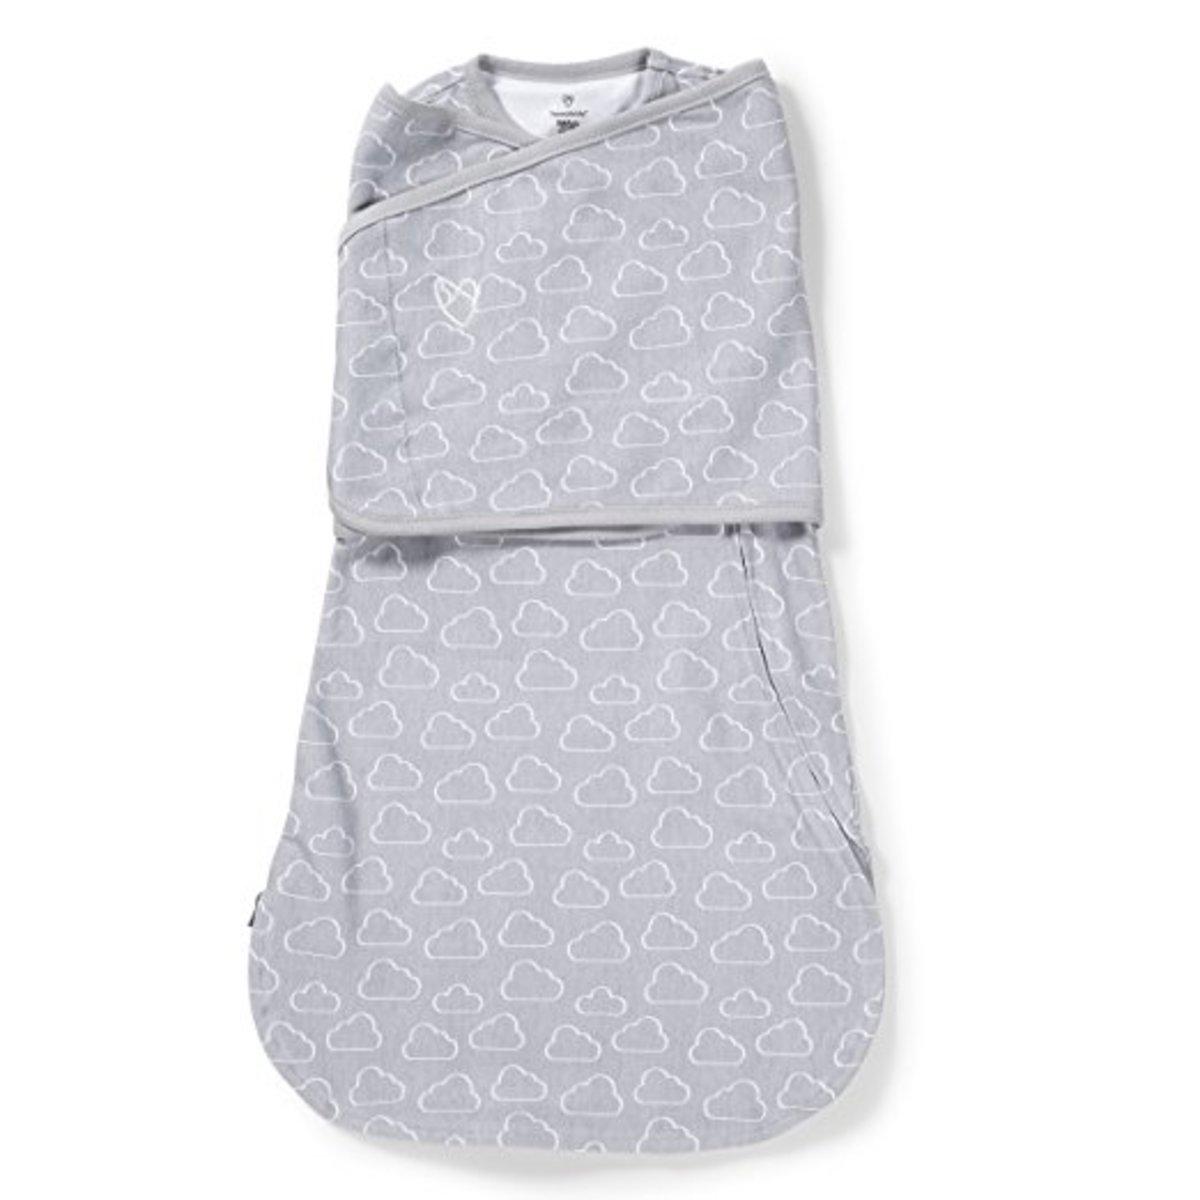 The Swaddle Sack